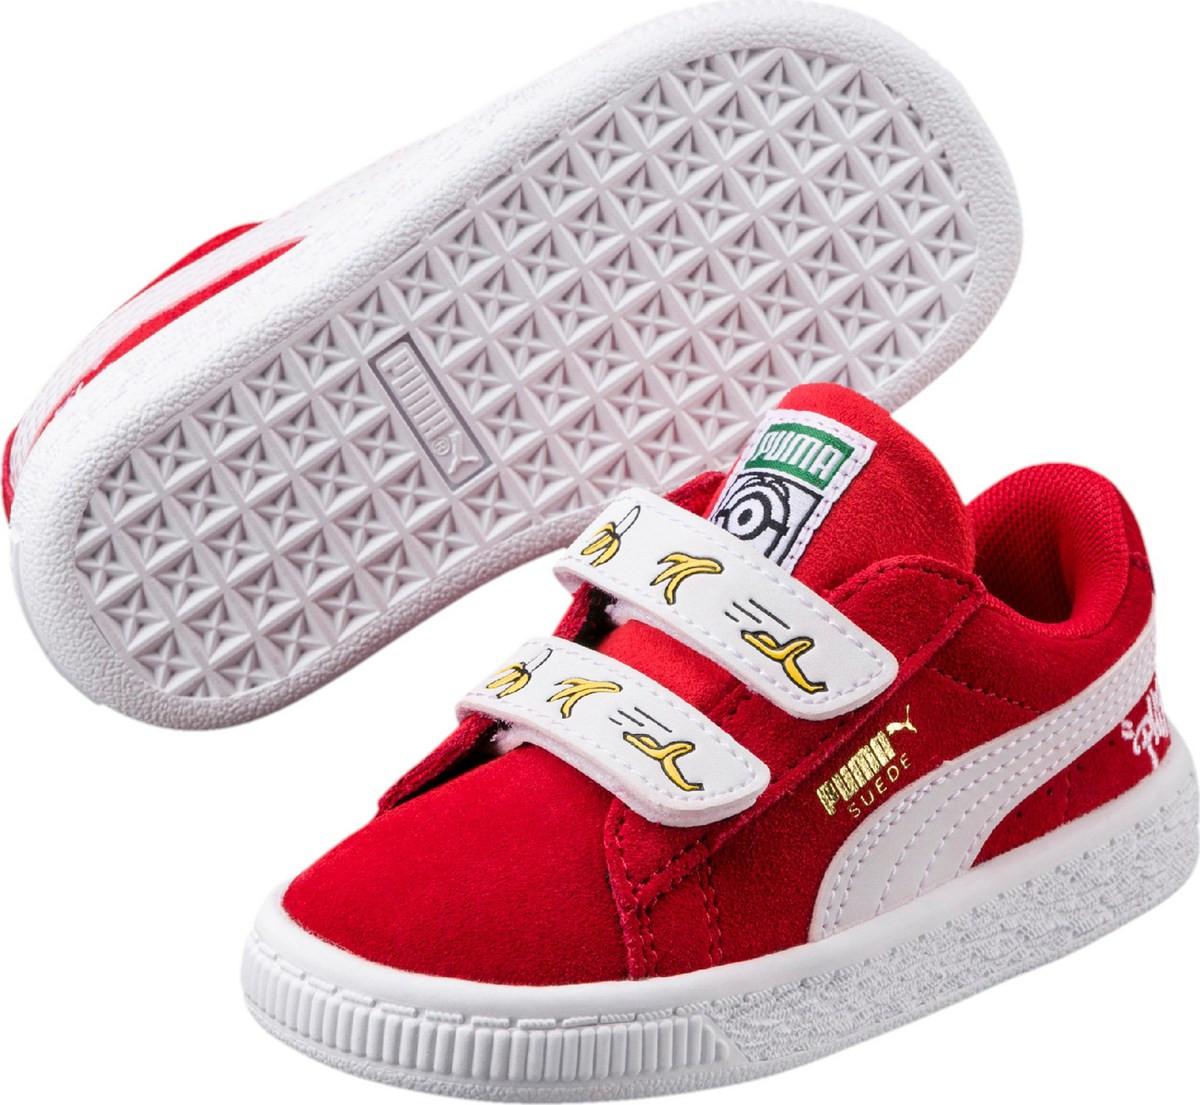 ee04f552c62 Αθλητικά Παπούτσια Αγοριών 19 • Puma | BestPrice.gr